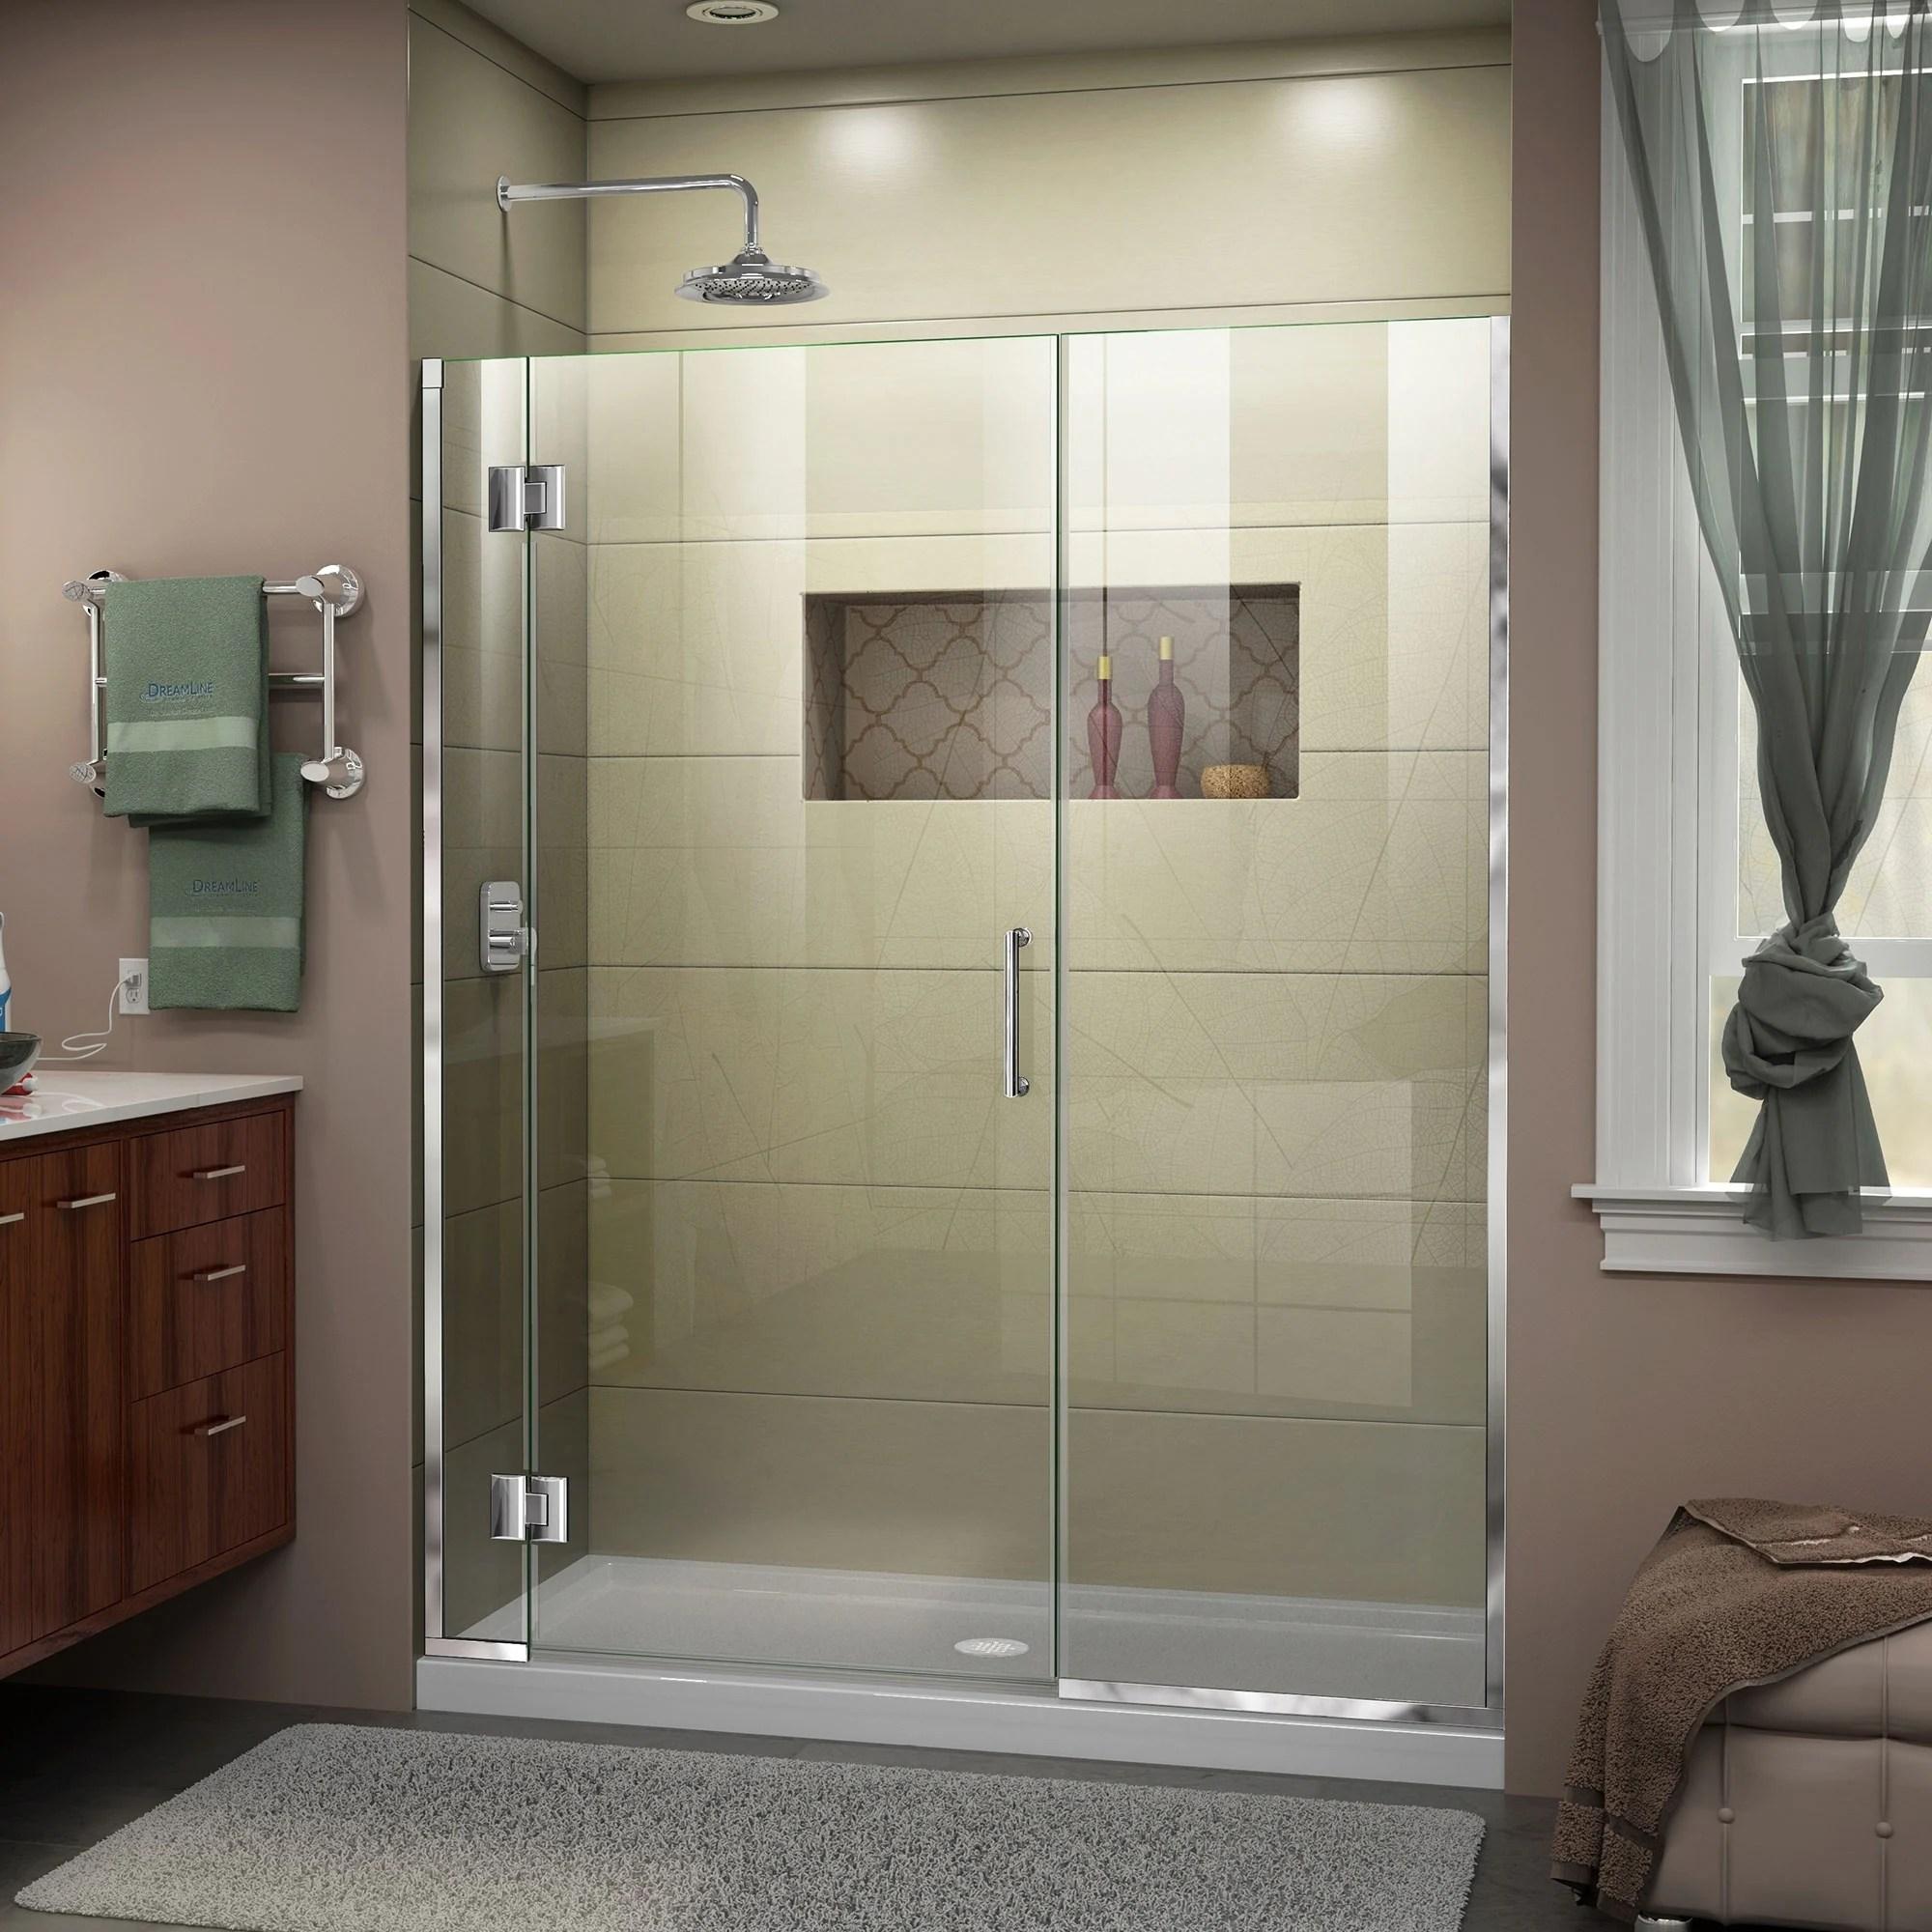 Buy Bronze Finish Shower Doors Online At Overstock Our